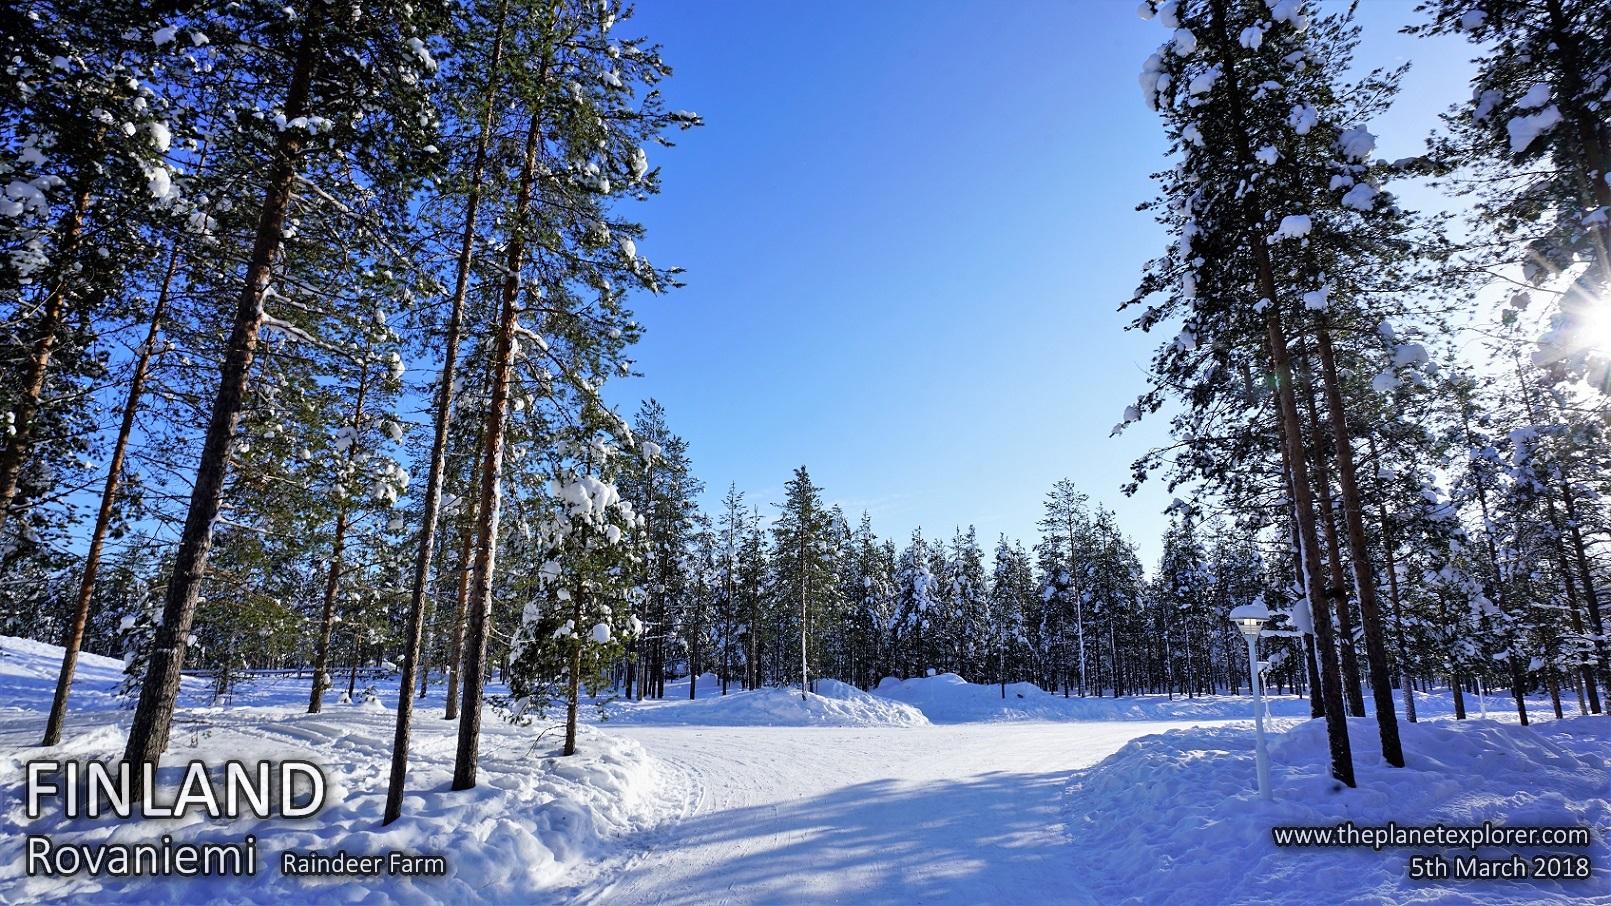 20180305_1315_Finland_Rovaniemi_Raindeer Farm_DSC09471_Sony a7R2_LR_@www